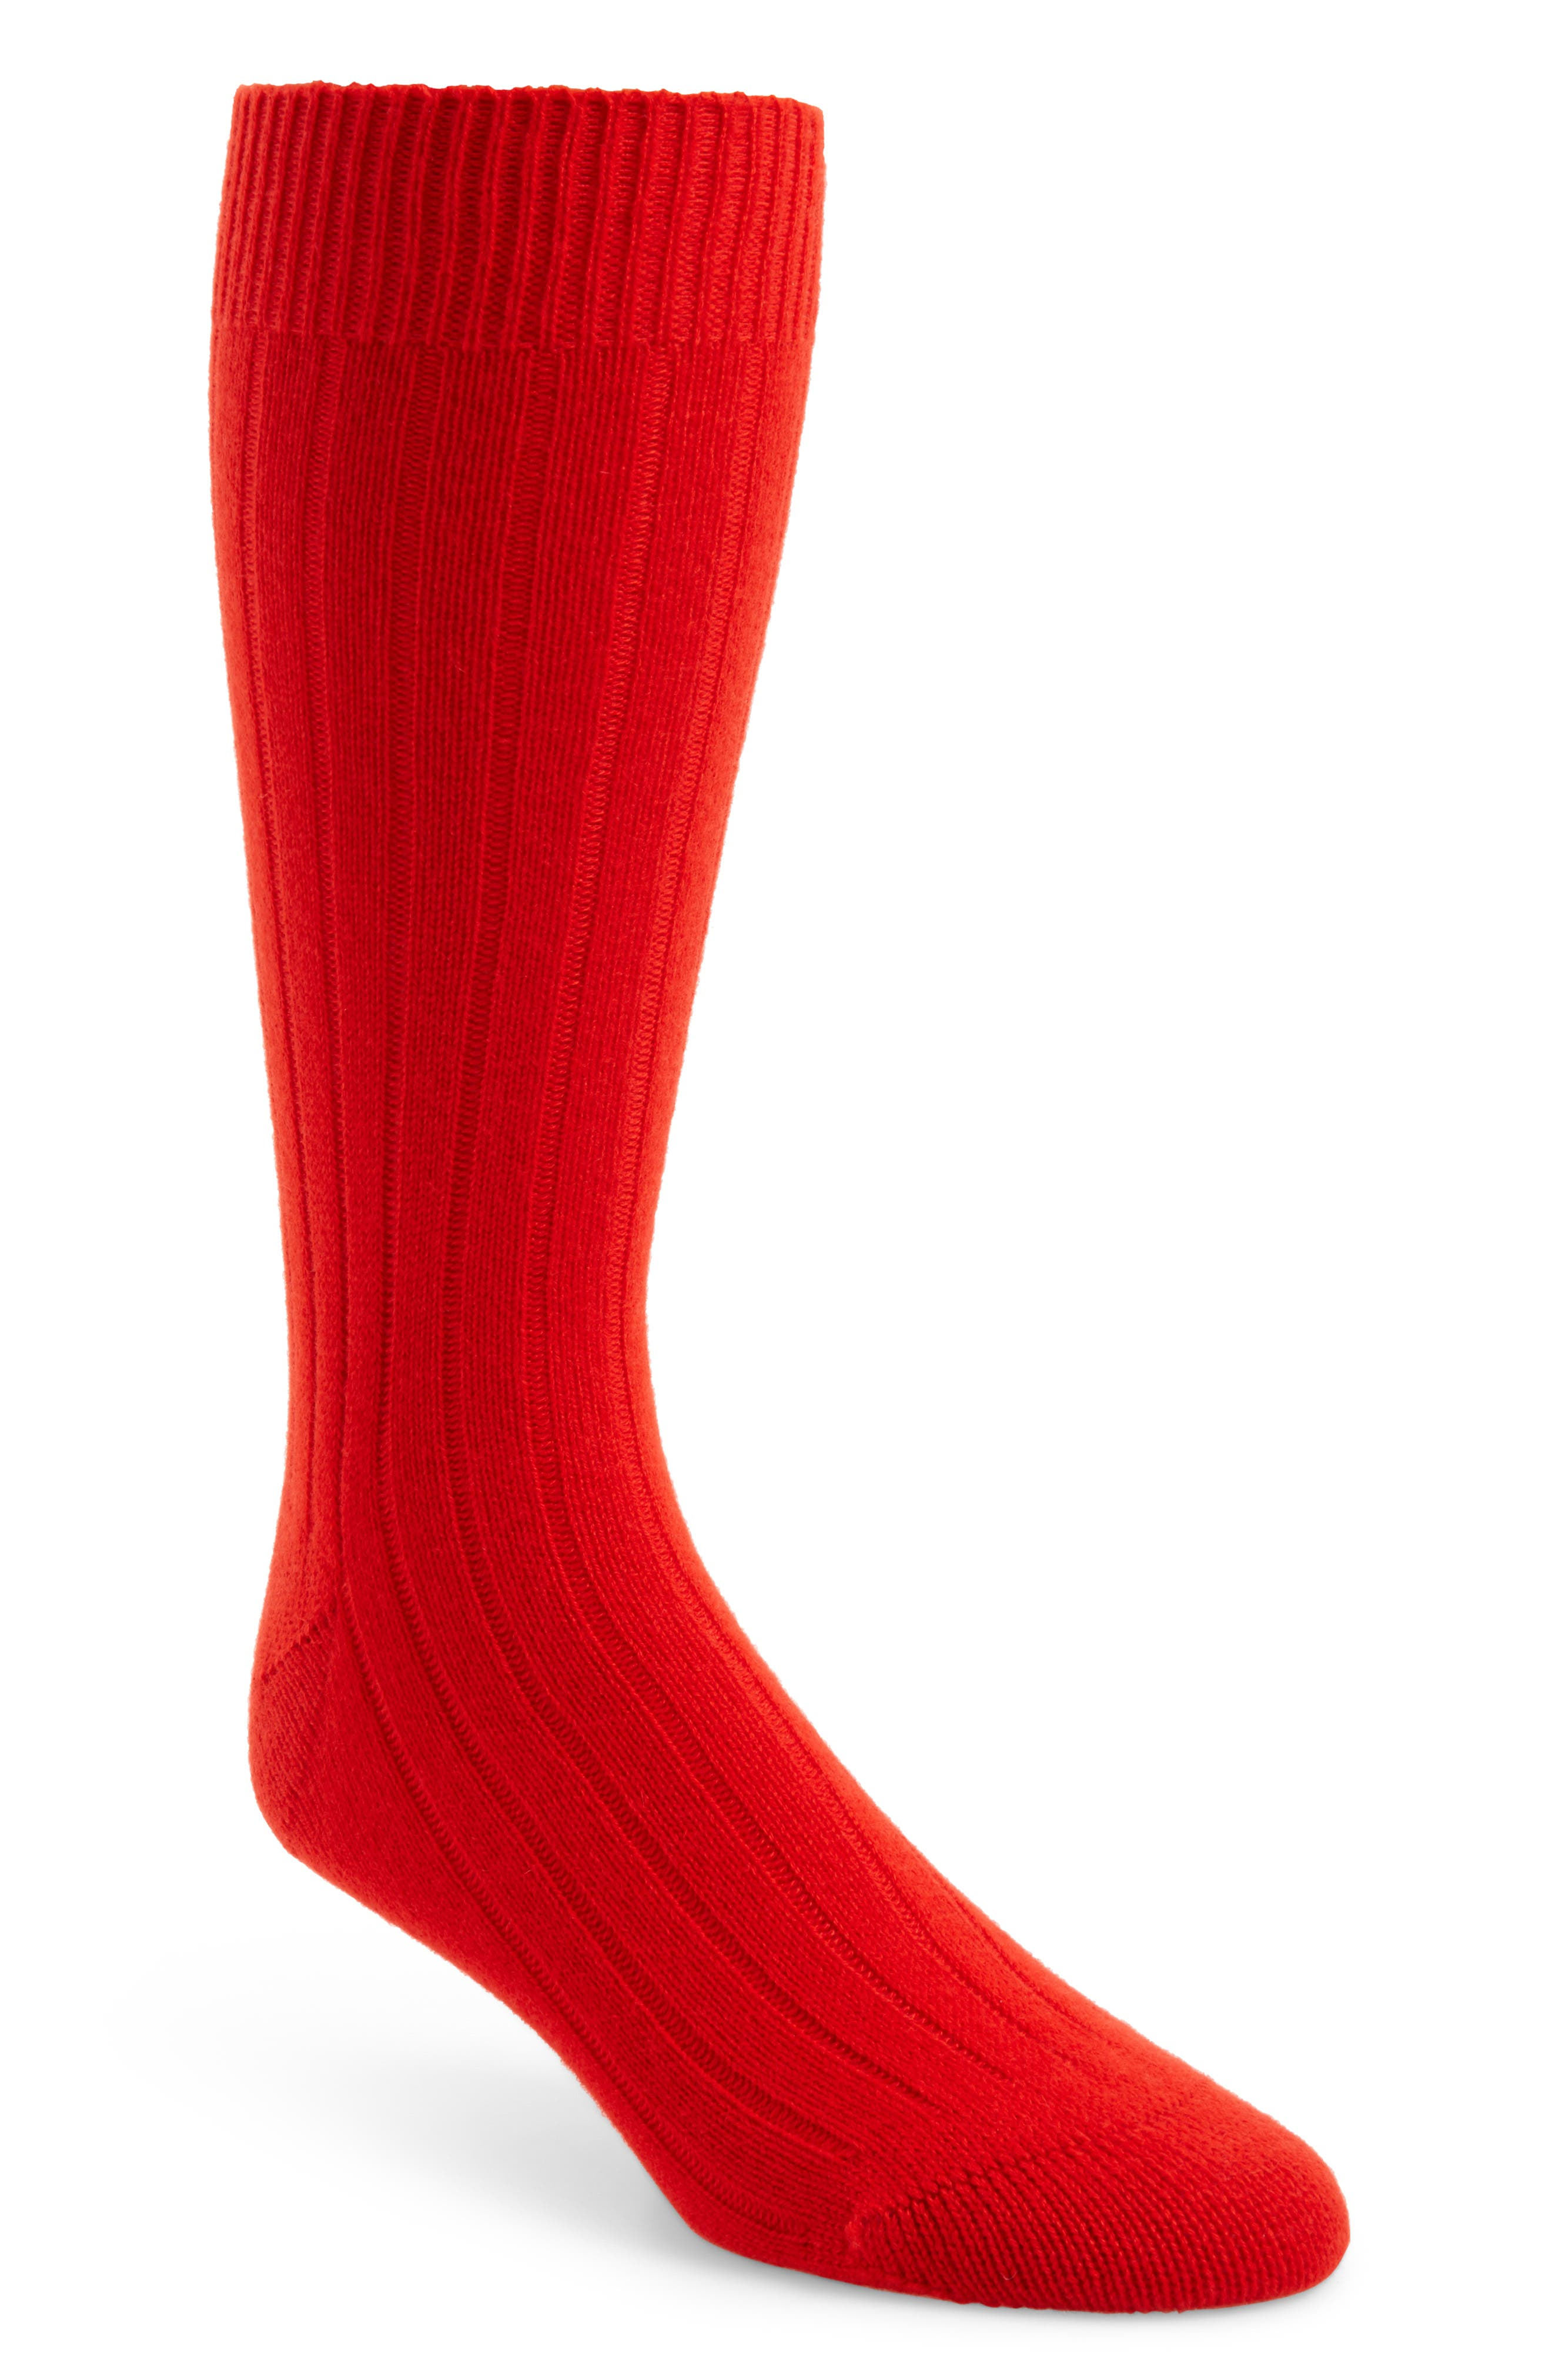 'Waddington' Cashmere Blend Mid Calf Socks,                             Main thumbnail 2, color,